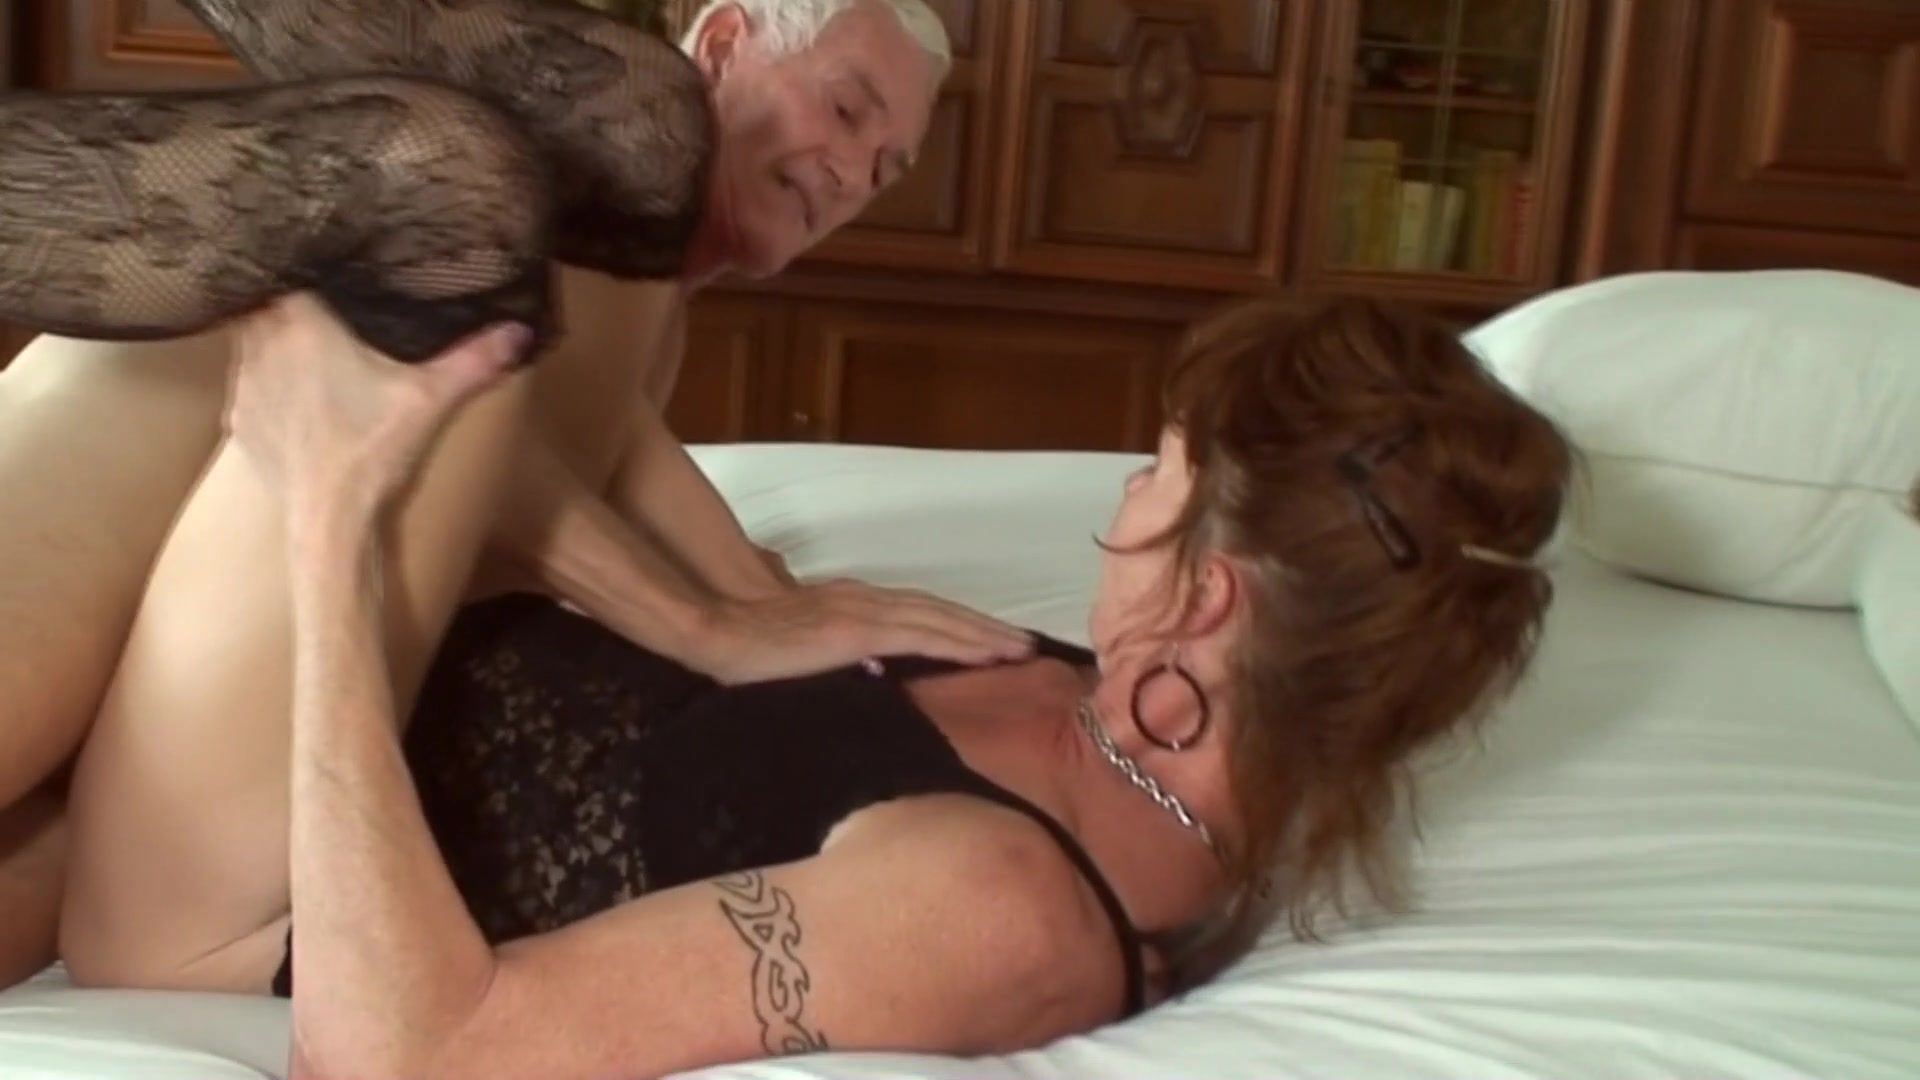 Las vegas escort sex